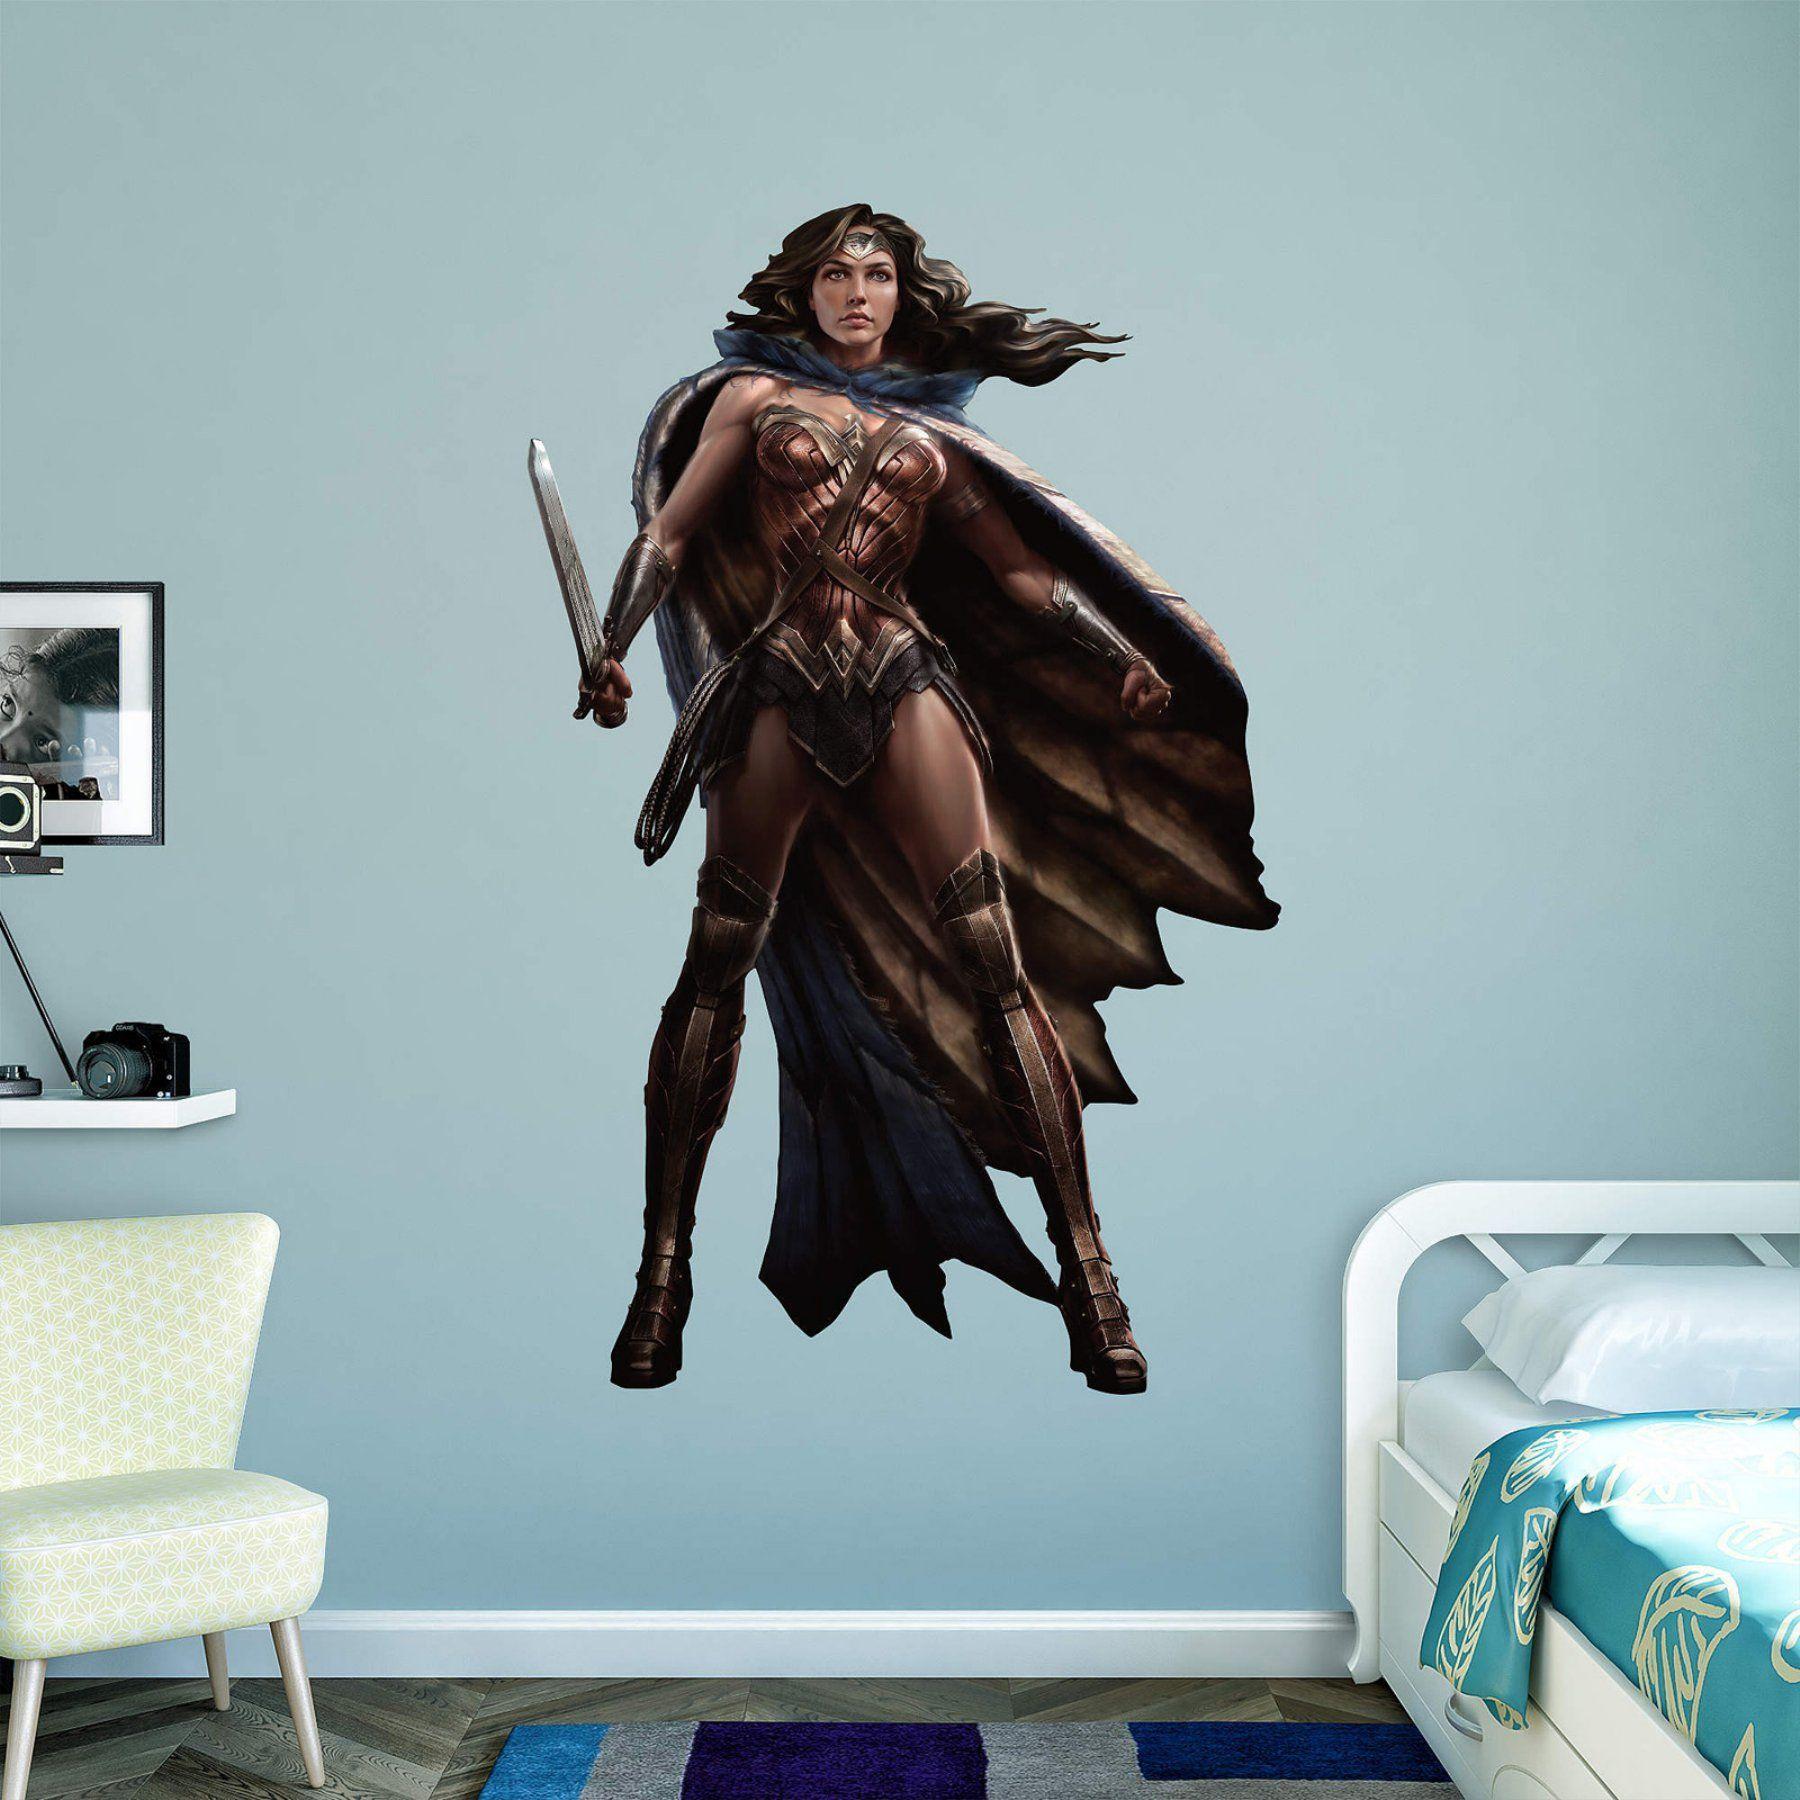 Fathead batman vs superman wonder woman wall decal 97 97125 superman wonder woman wall decal 97 97125 amipublicfo Choice Image